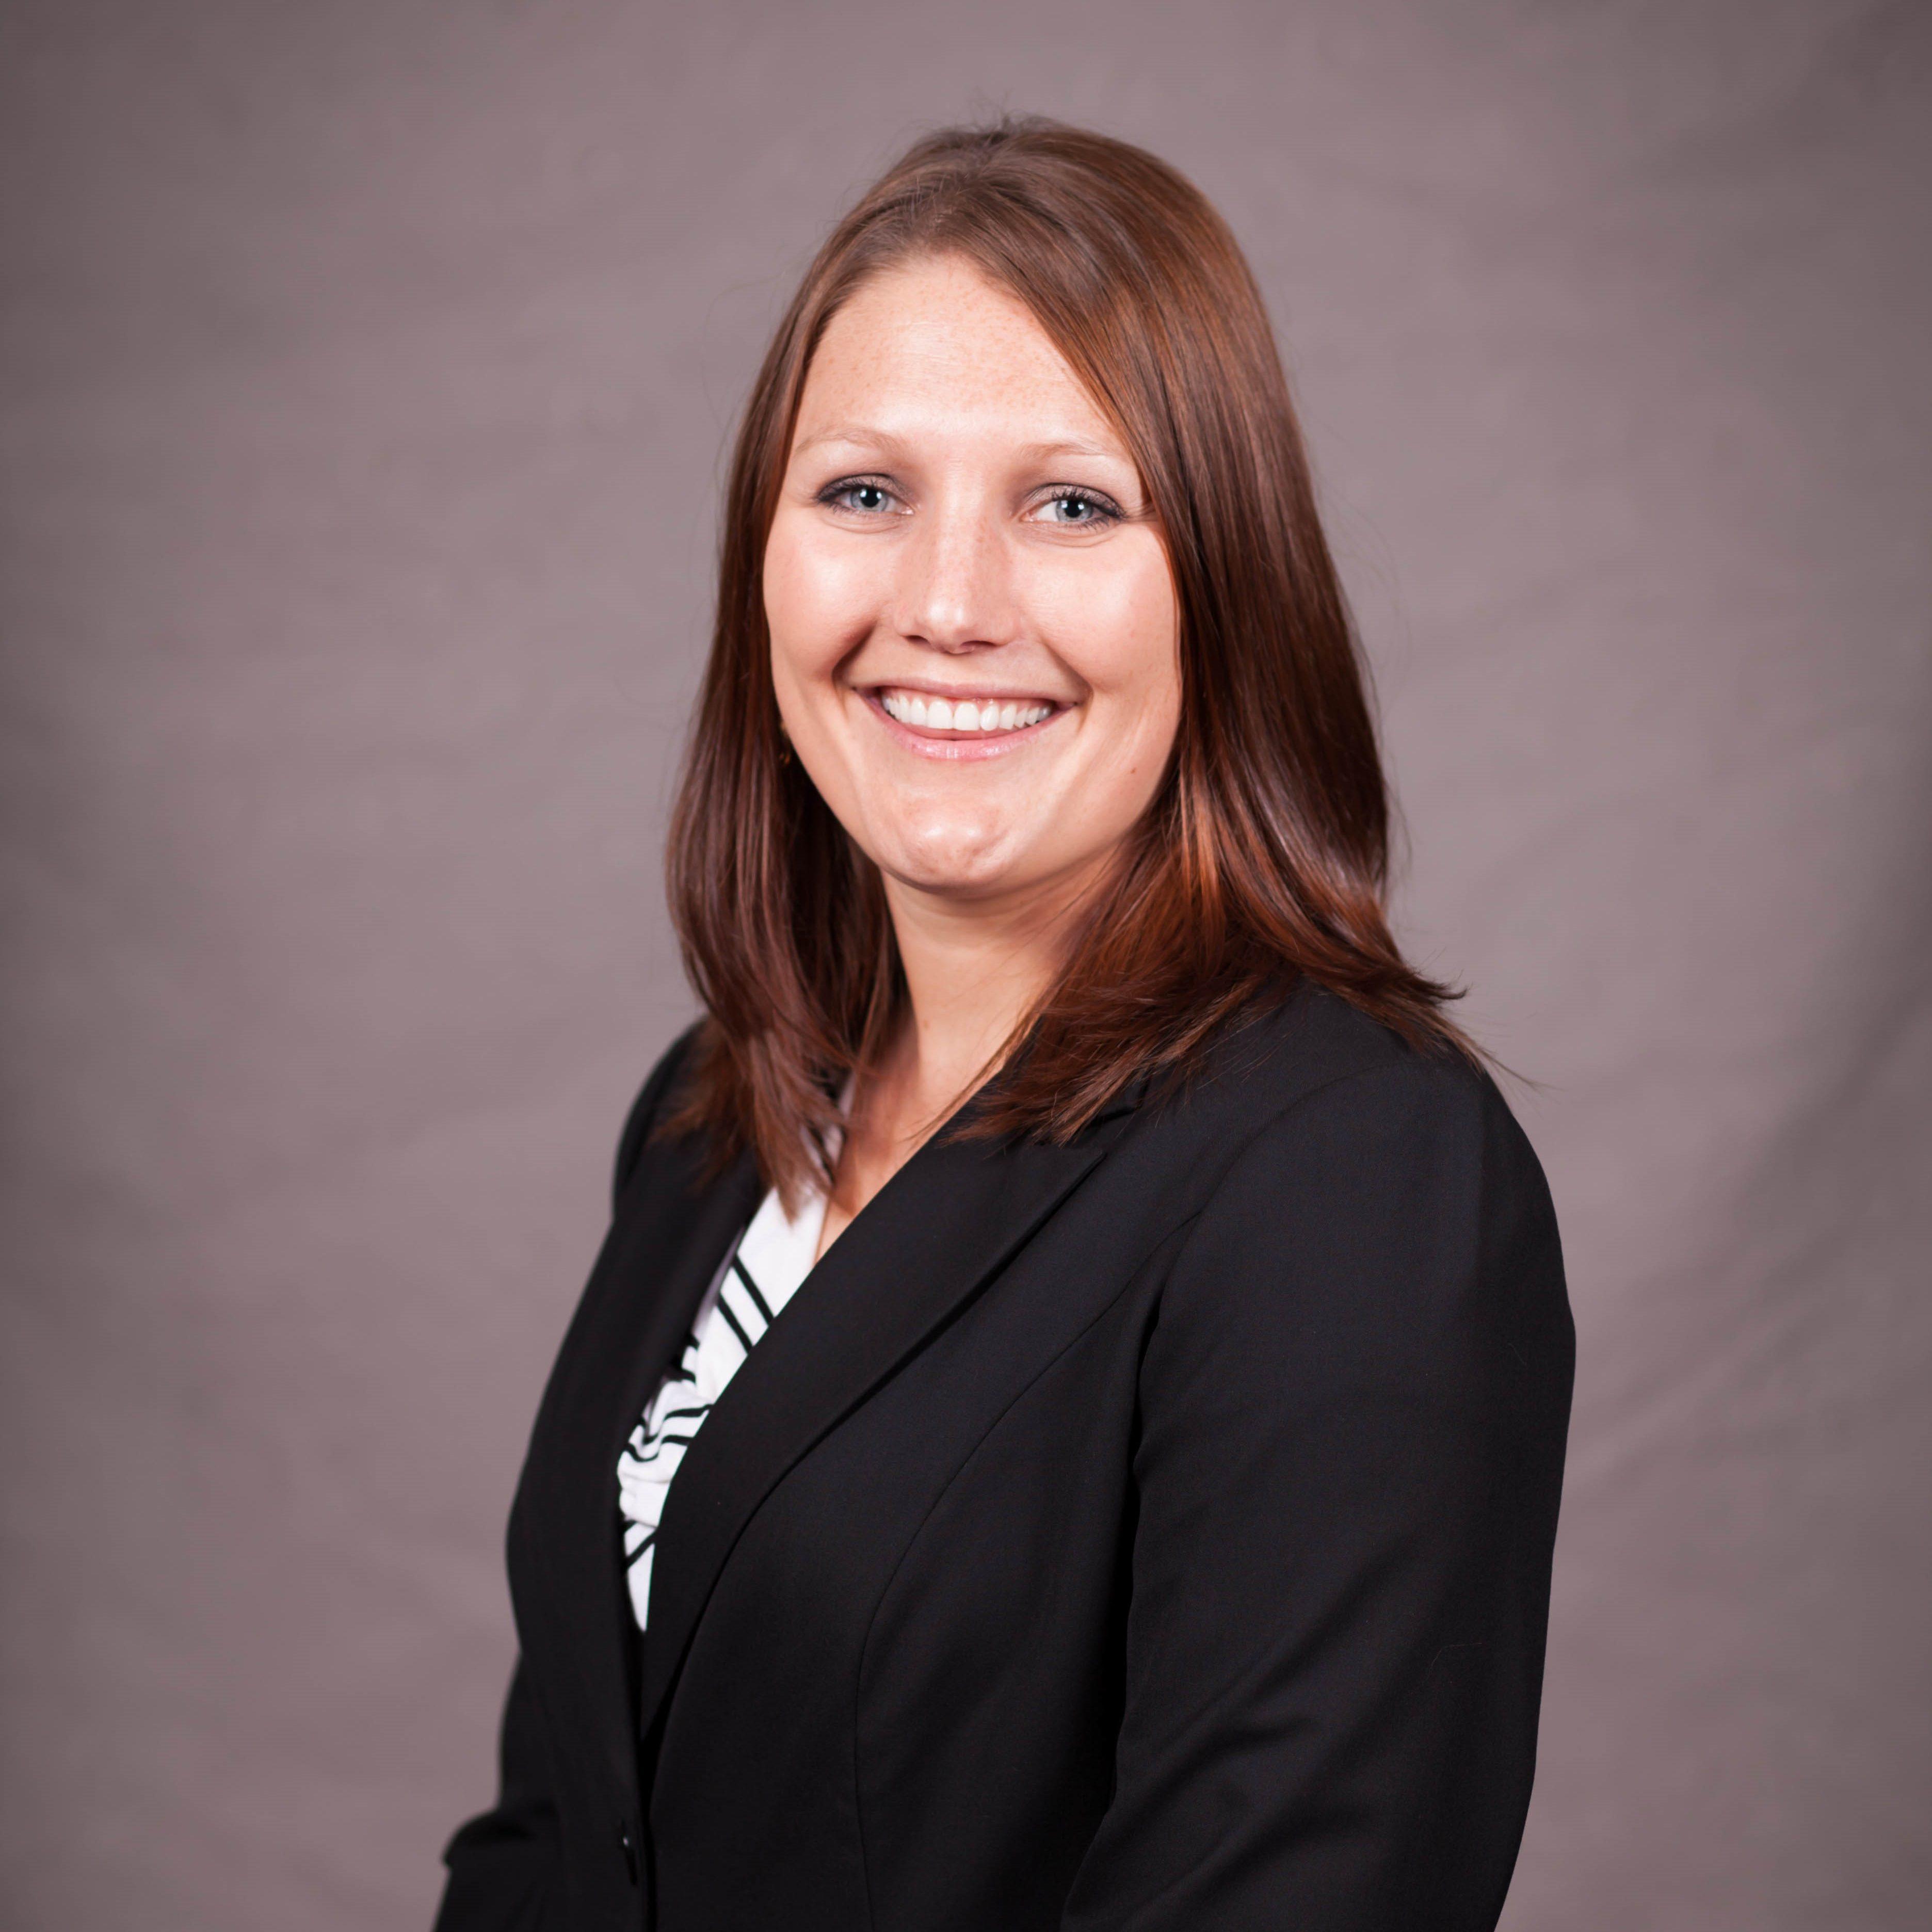 Rachel_Tietjen_dentist_South Sioux City -2013